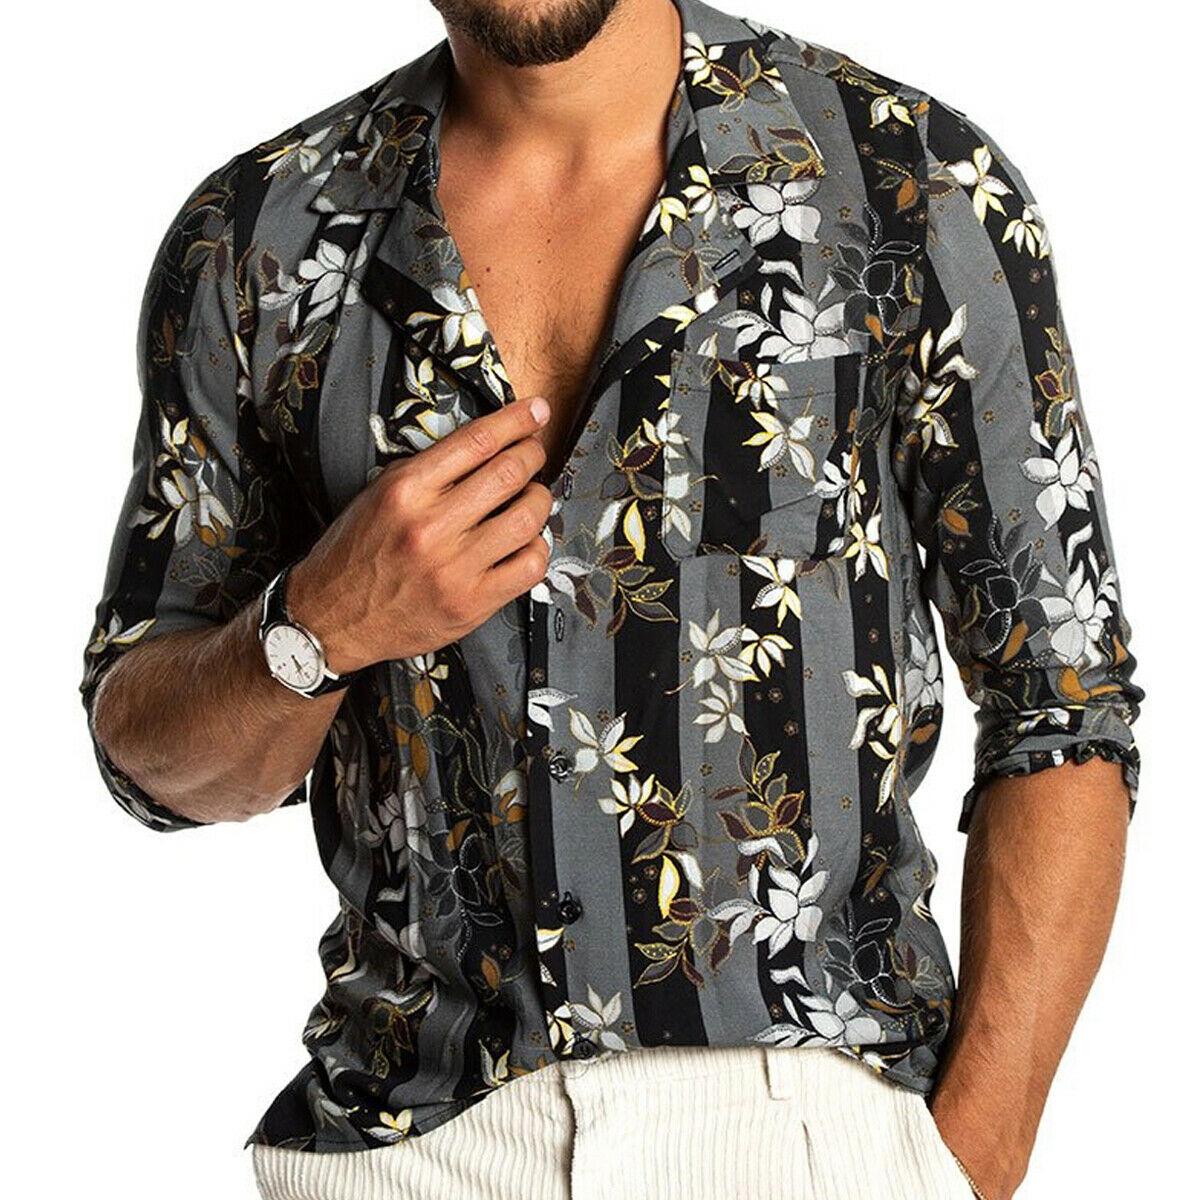 Fashion Summer Mens Hawaiian Shirt Beach Style Floral V Neck Casual Shirts Blouse Hawaii Aloha Party Summer Holiday Fancy Tops